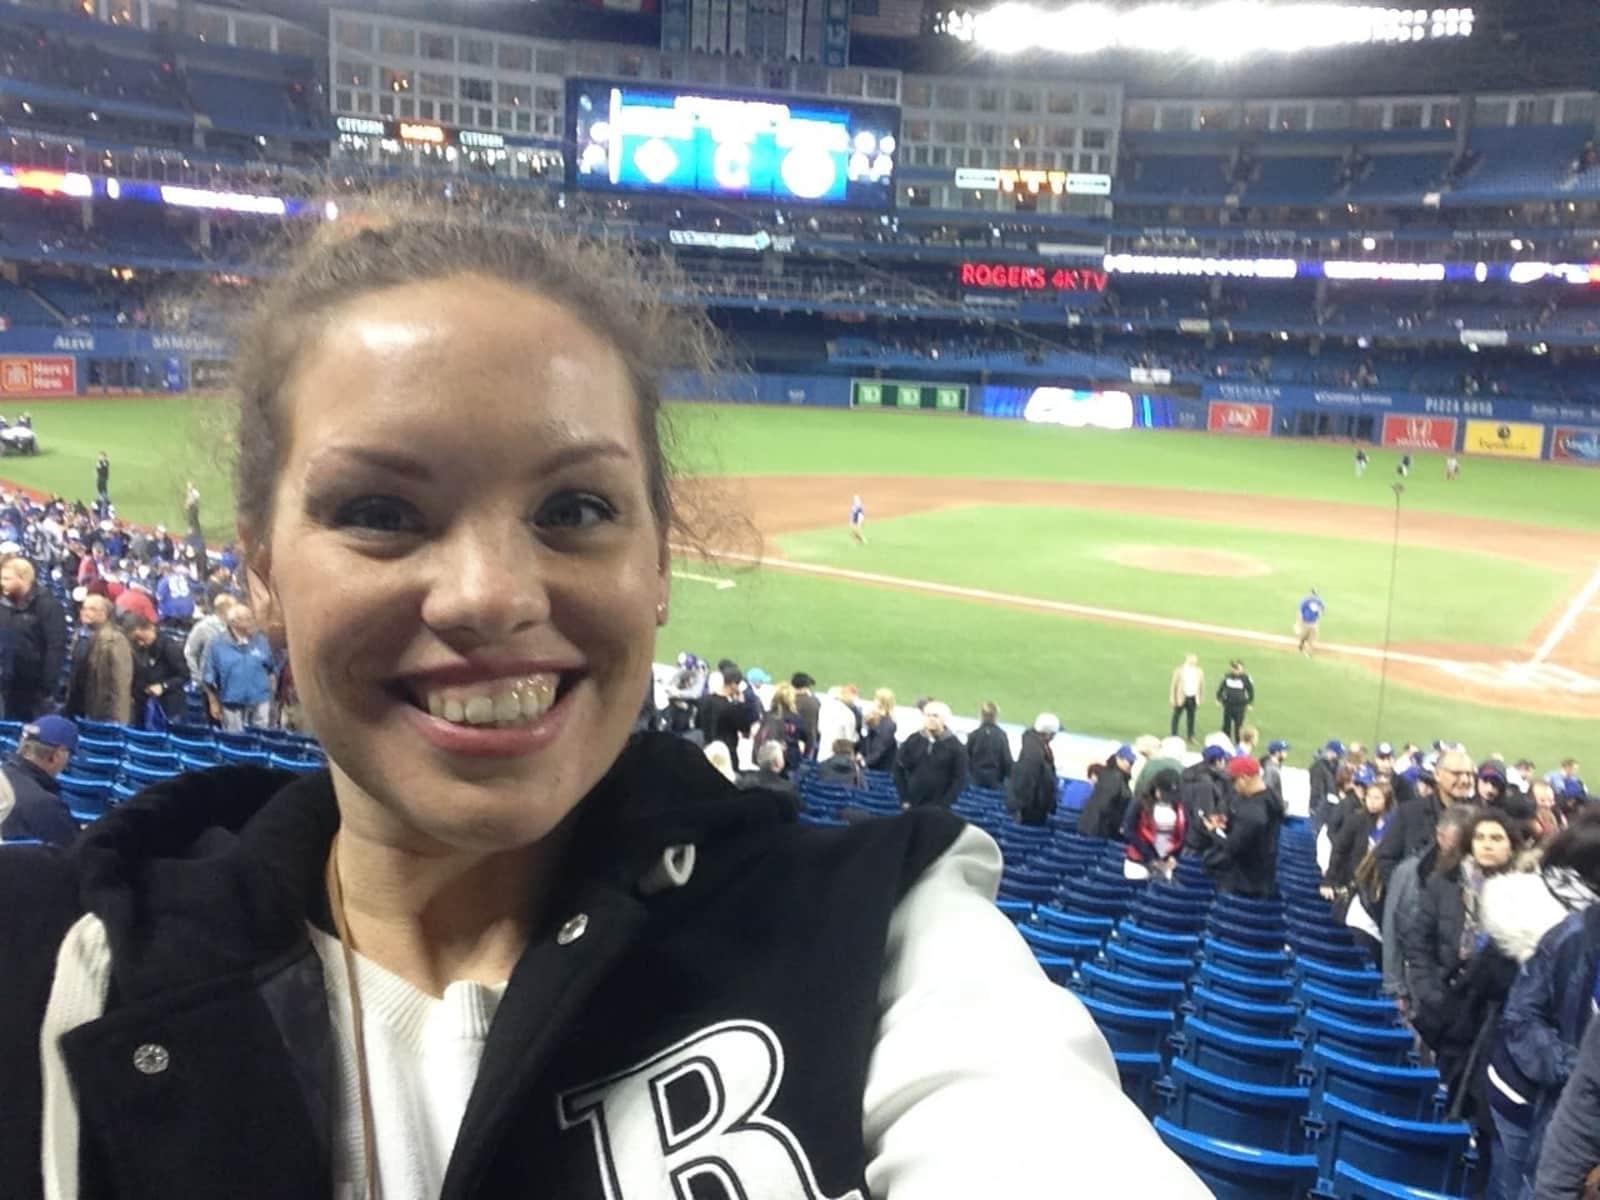 Helen from Toronto, Ontario, Canada